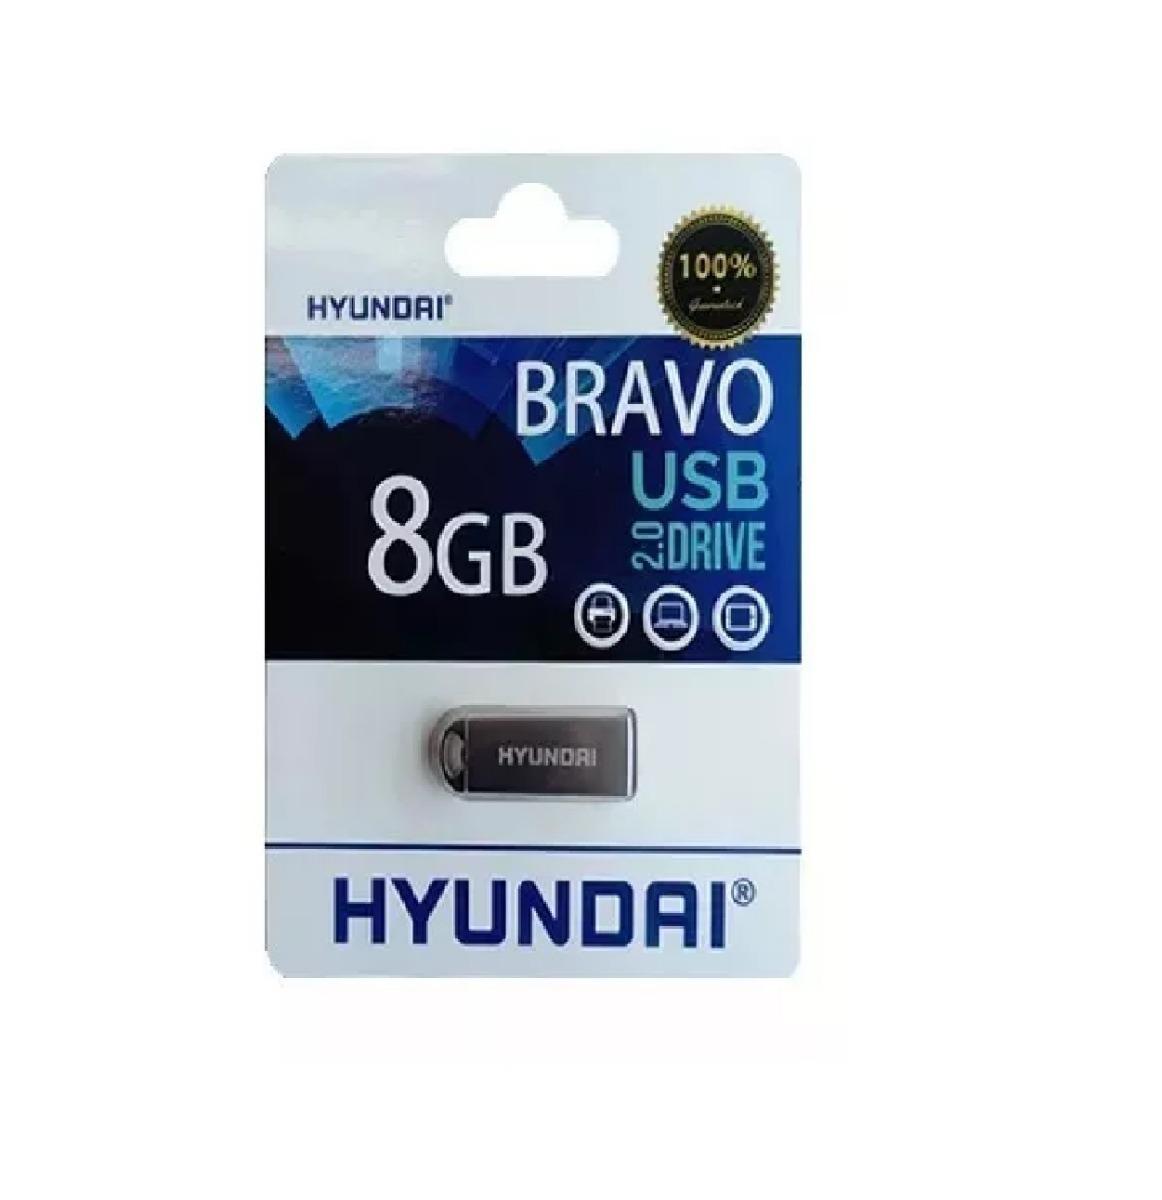 58f9a701c26183 memoria usb hyundai 8gb bravo keychain 2.0 plata metalica. Cargando zoom.